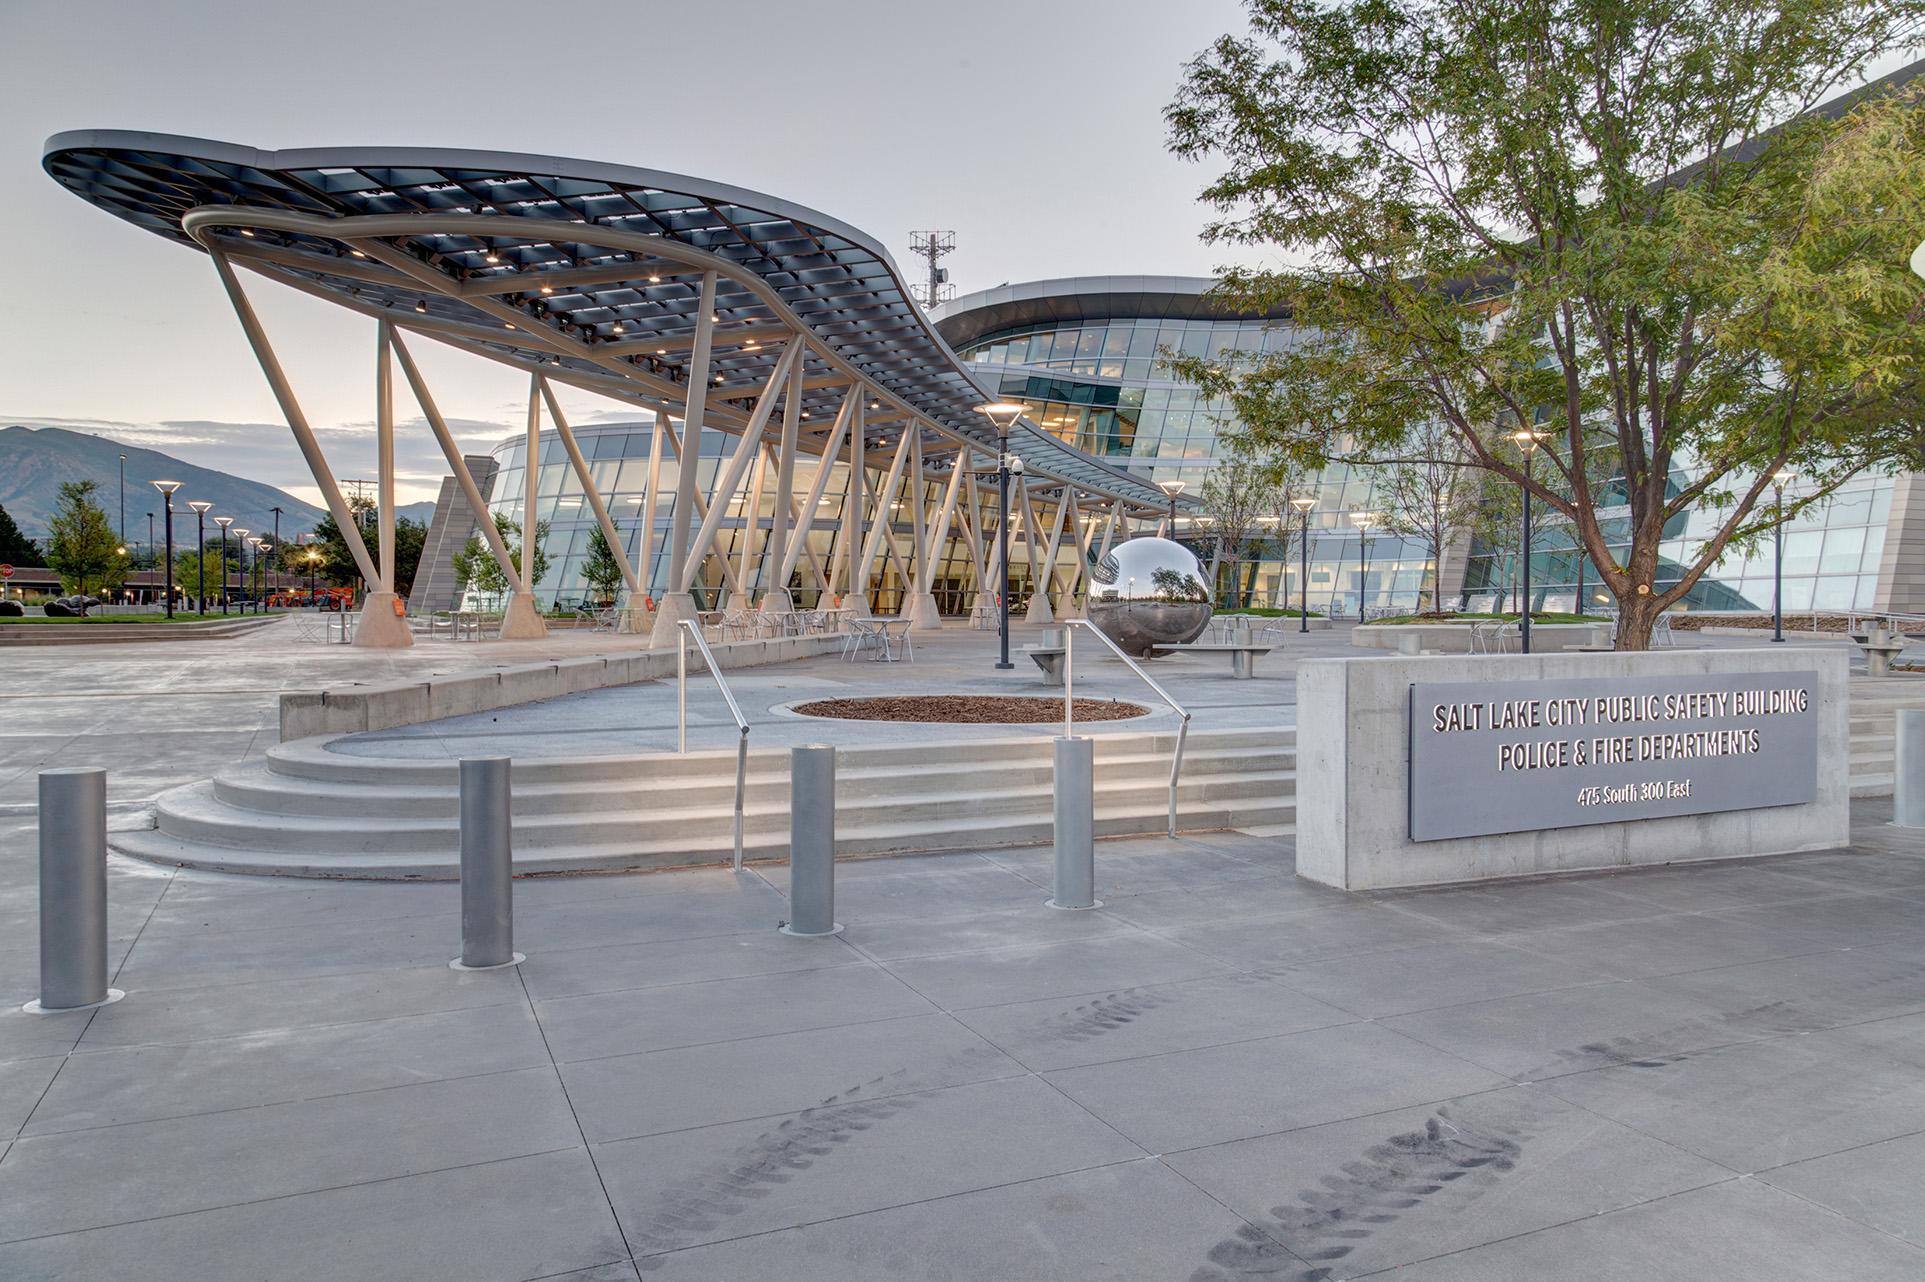 Police Officer Gear Storage at Salt Lake City Public Safety Building